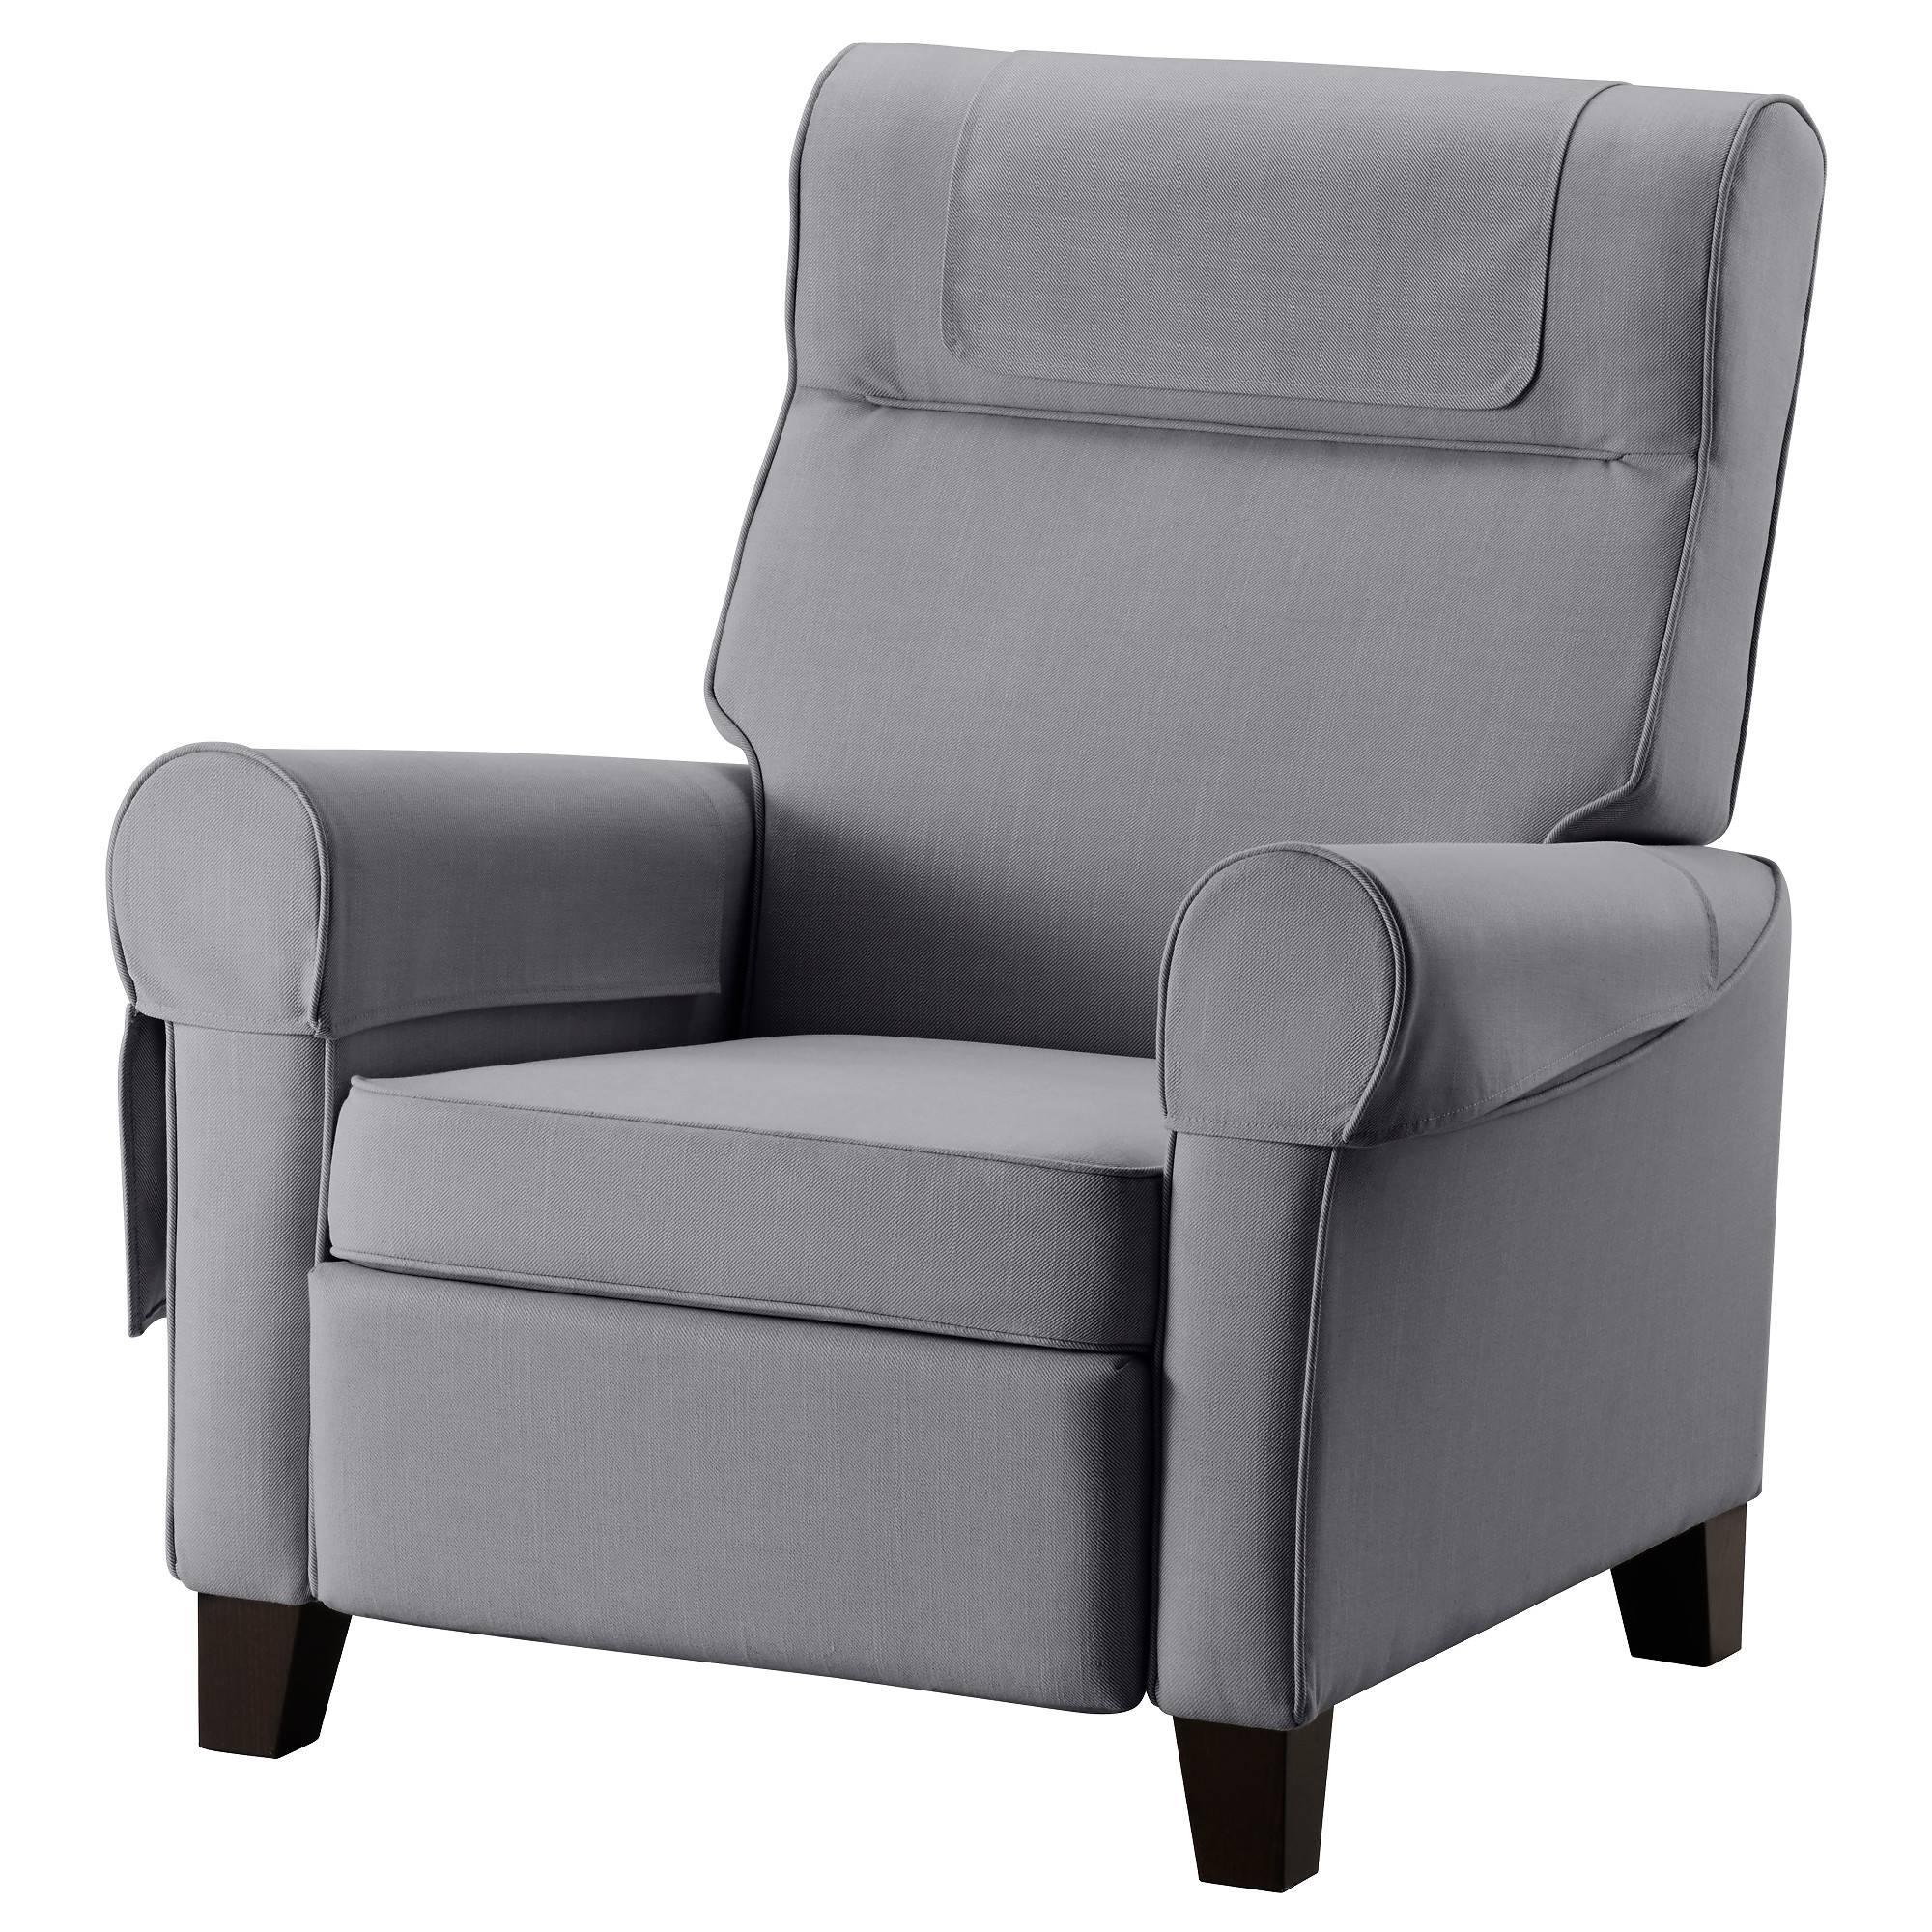 Muren Recliner - Nordvalla Beige - Ikea pertaining to Fabric Armchairs (Image 21 of 30)